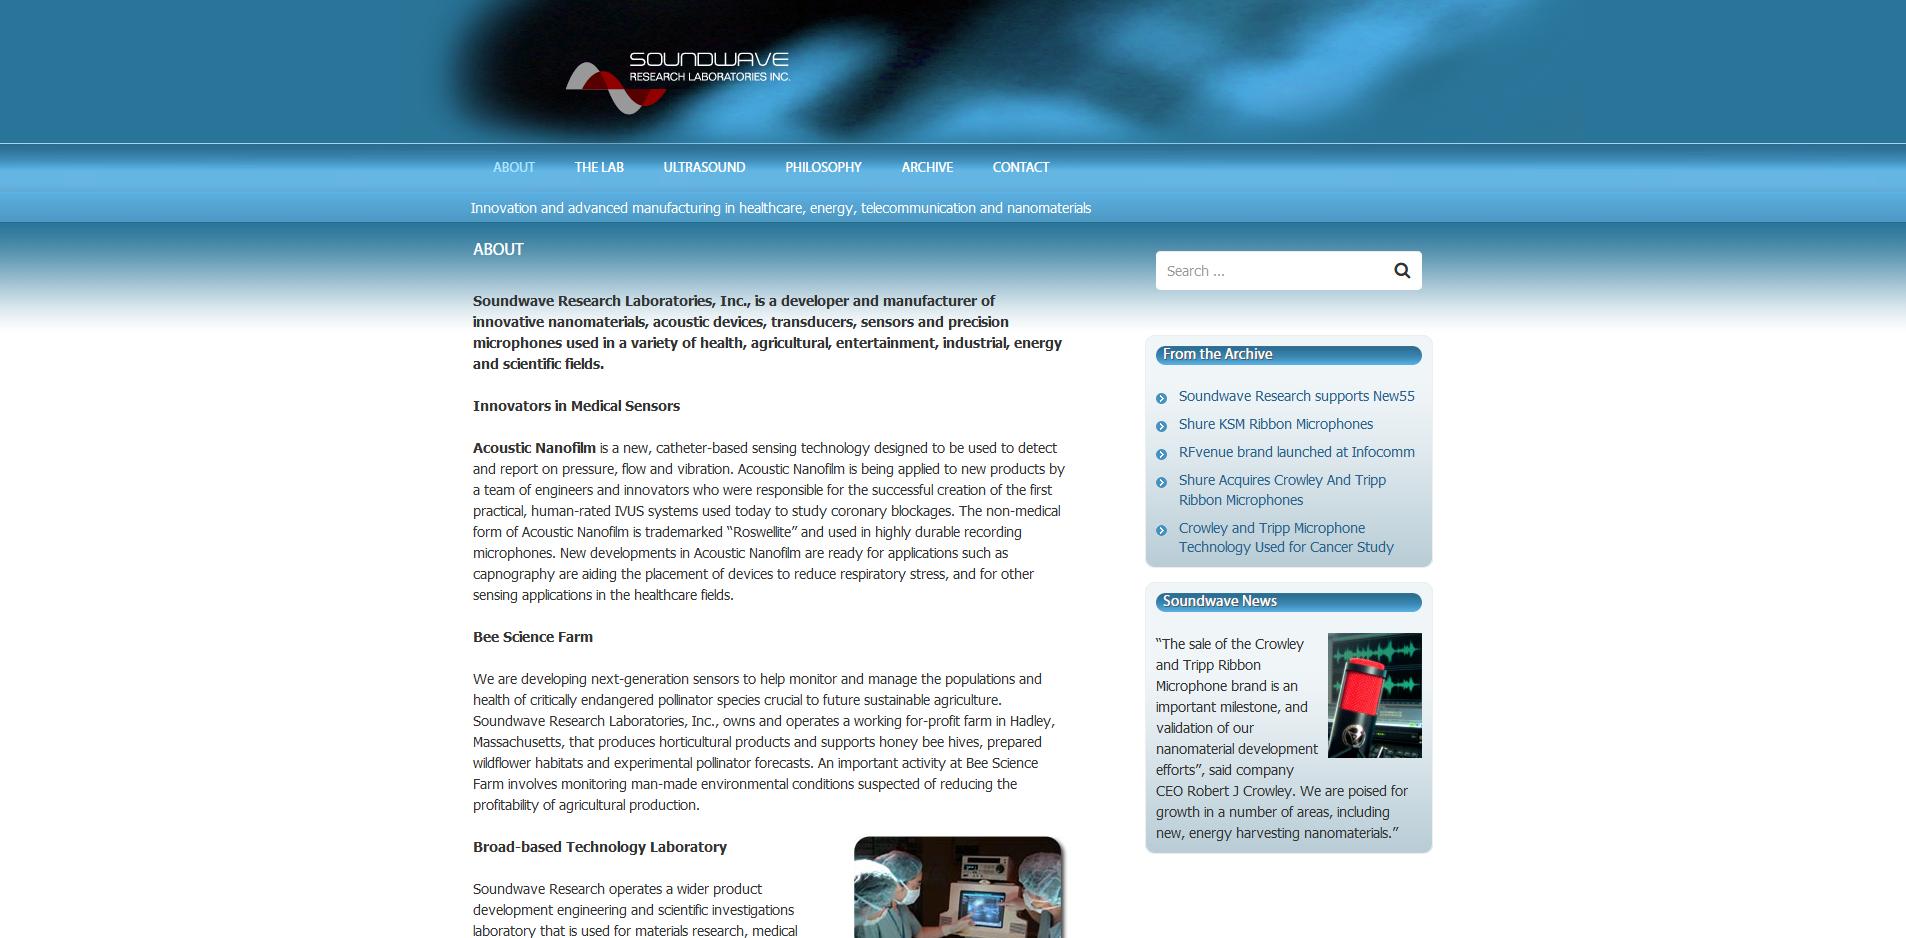 Soundwave Research Laboratories